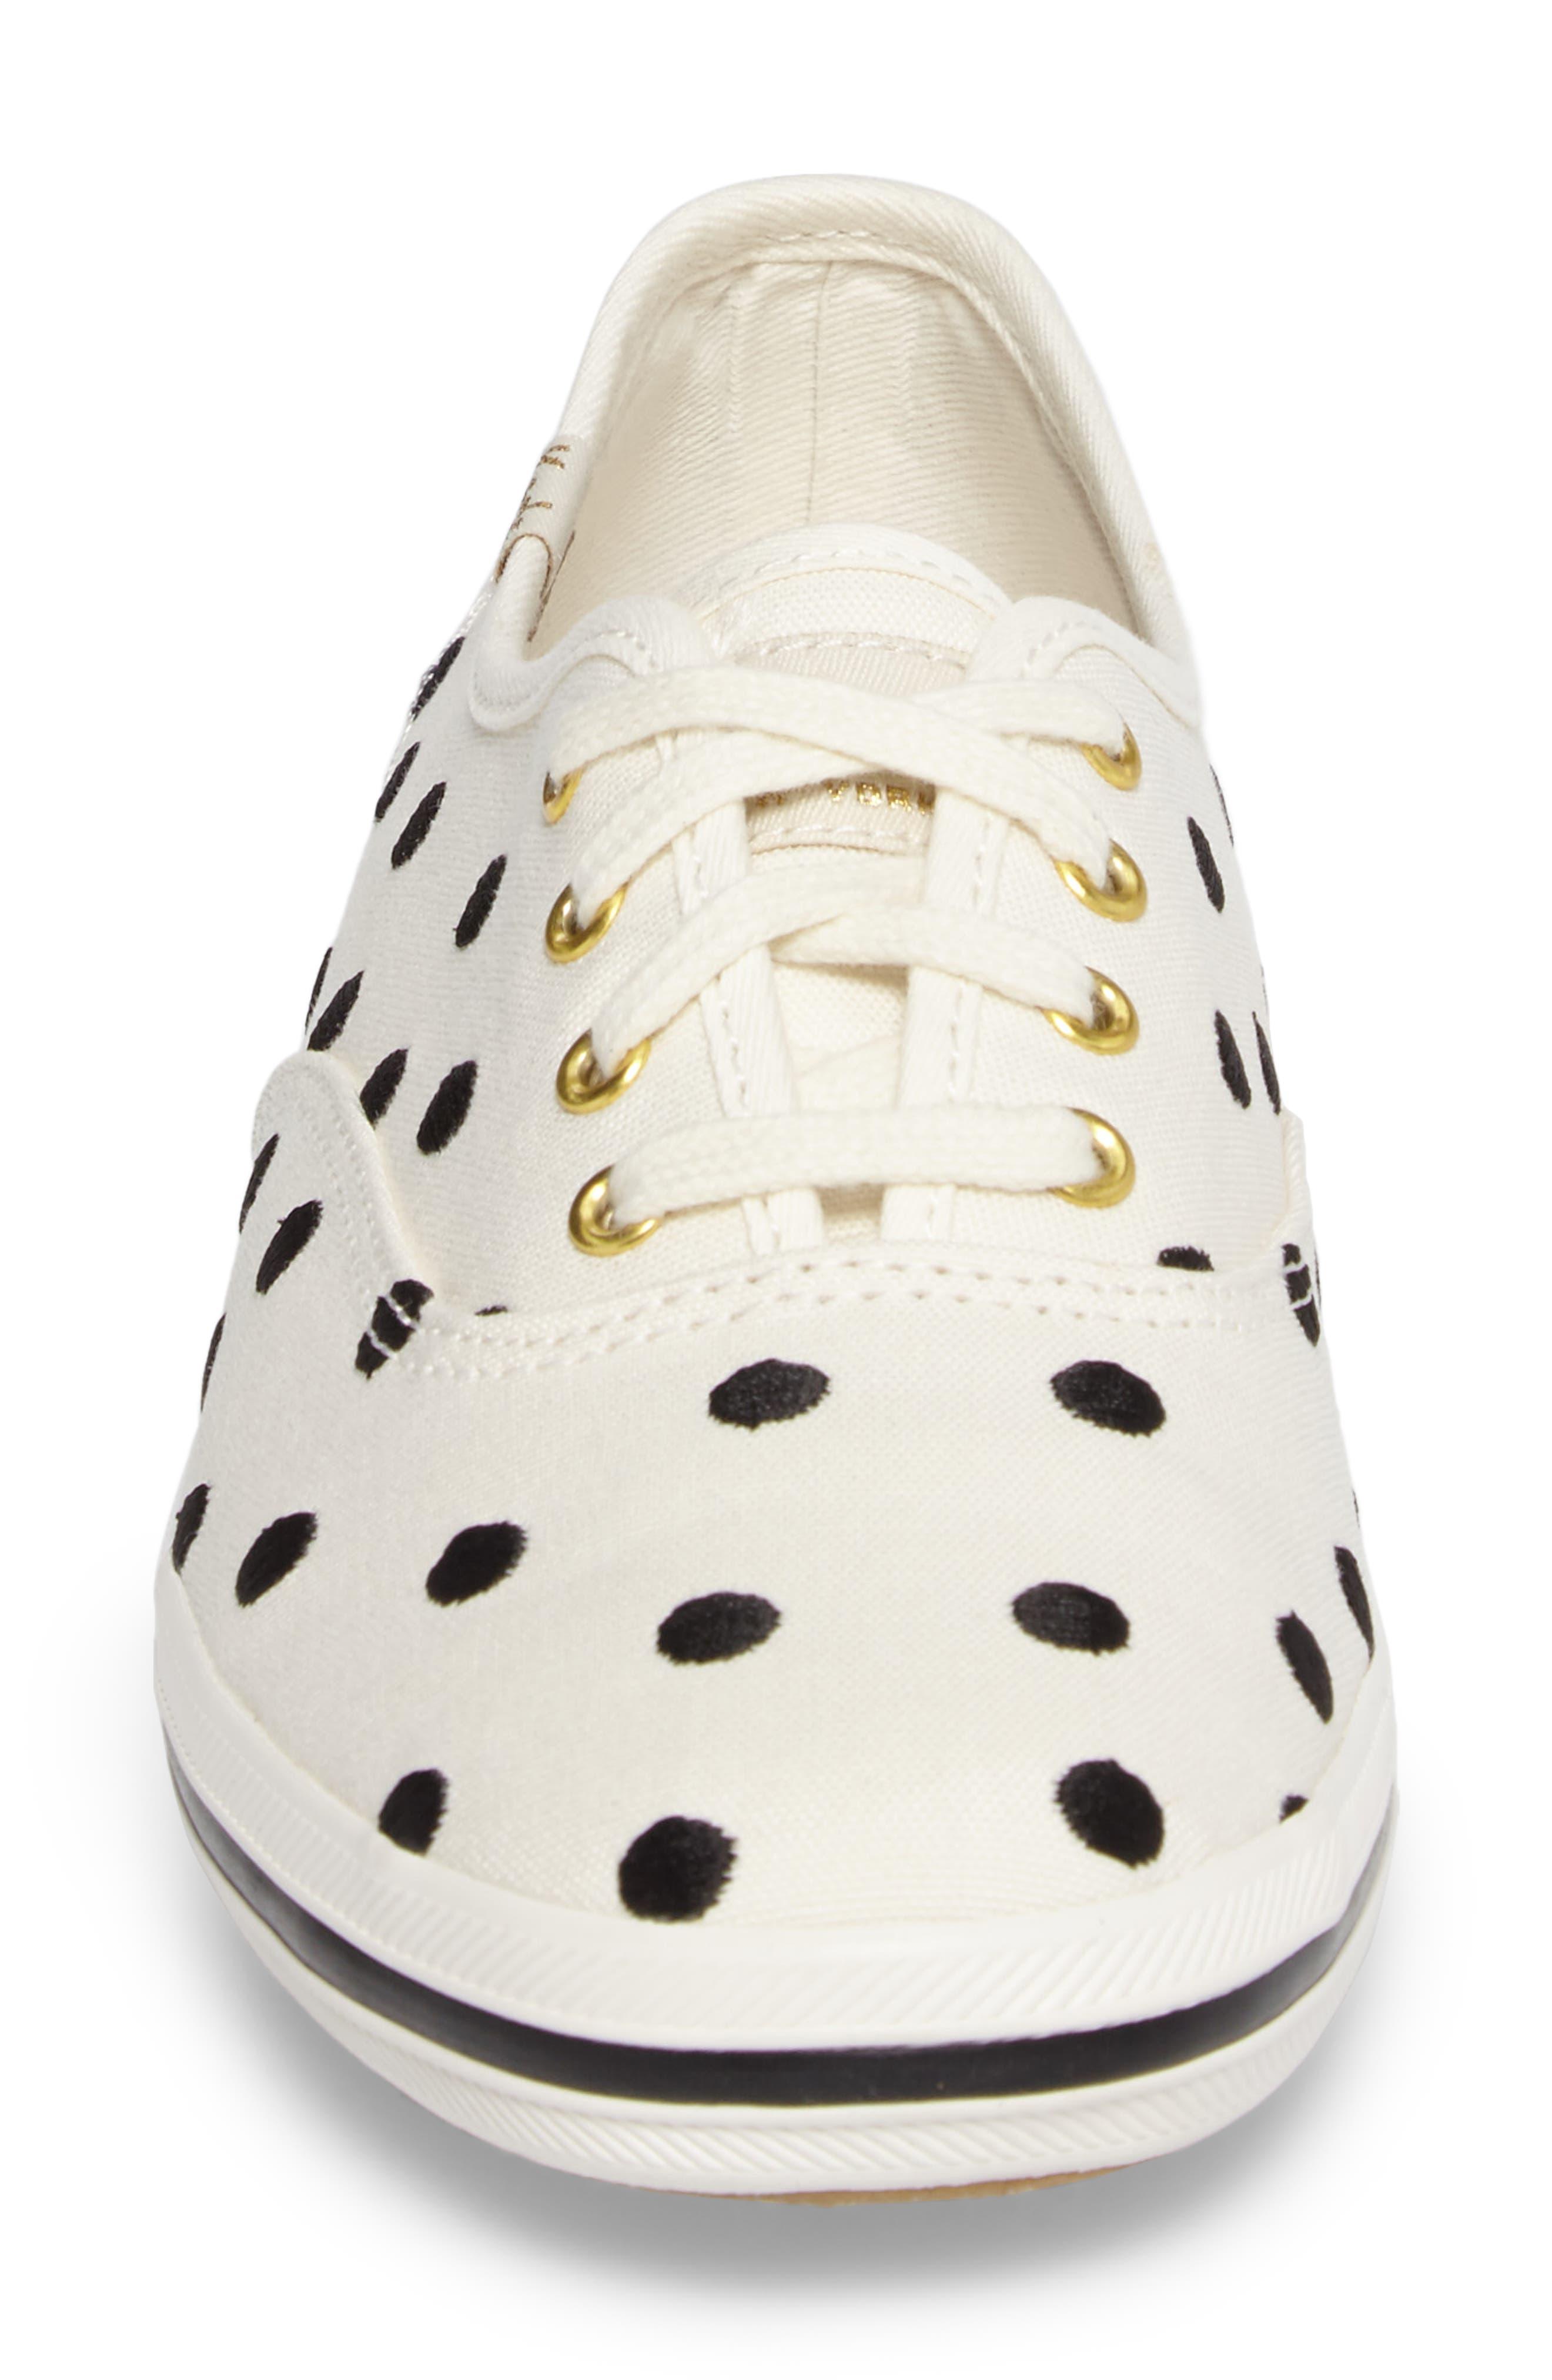 Keds<sup>®</sup> x kate spade new york champion sneaker,                             Alternate thumbnail 4, color,                             Pristine/ Black